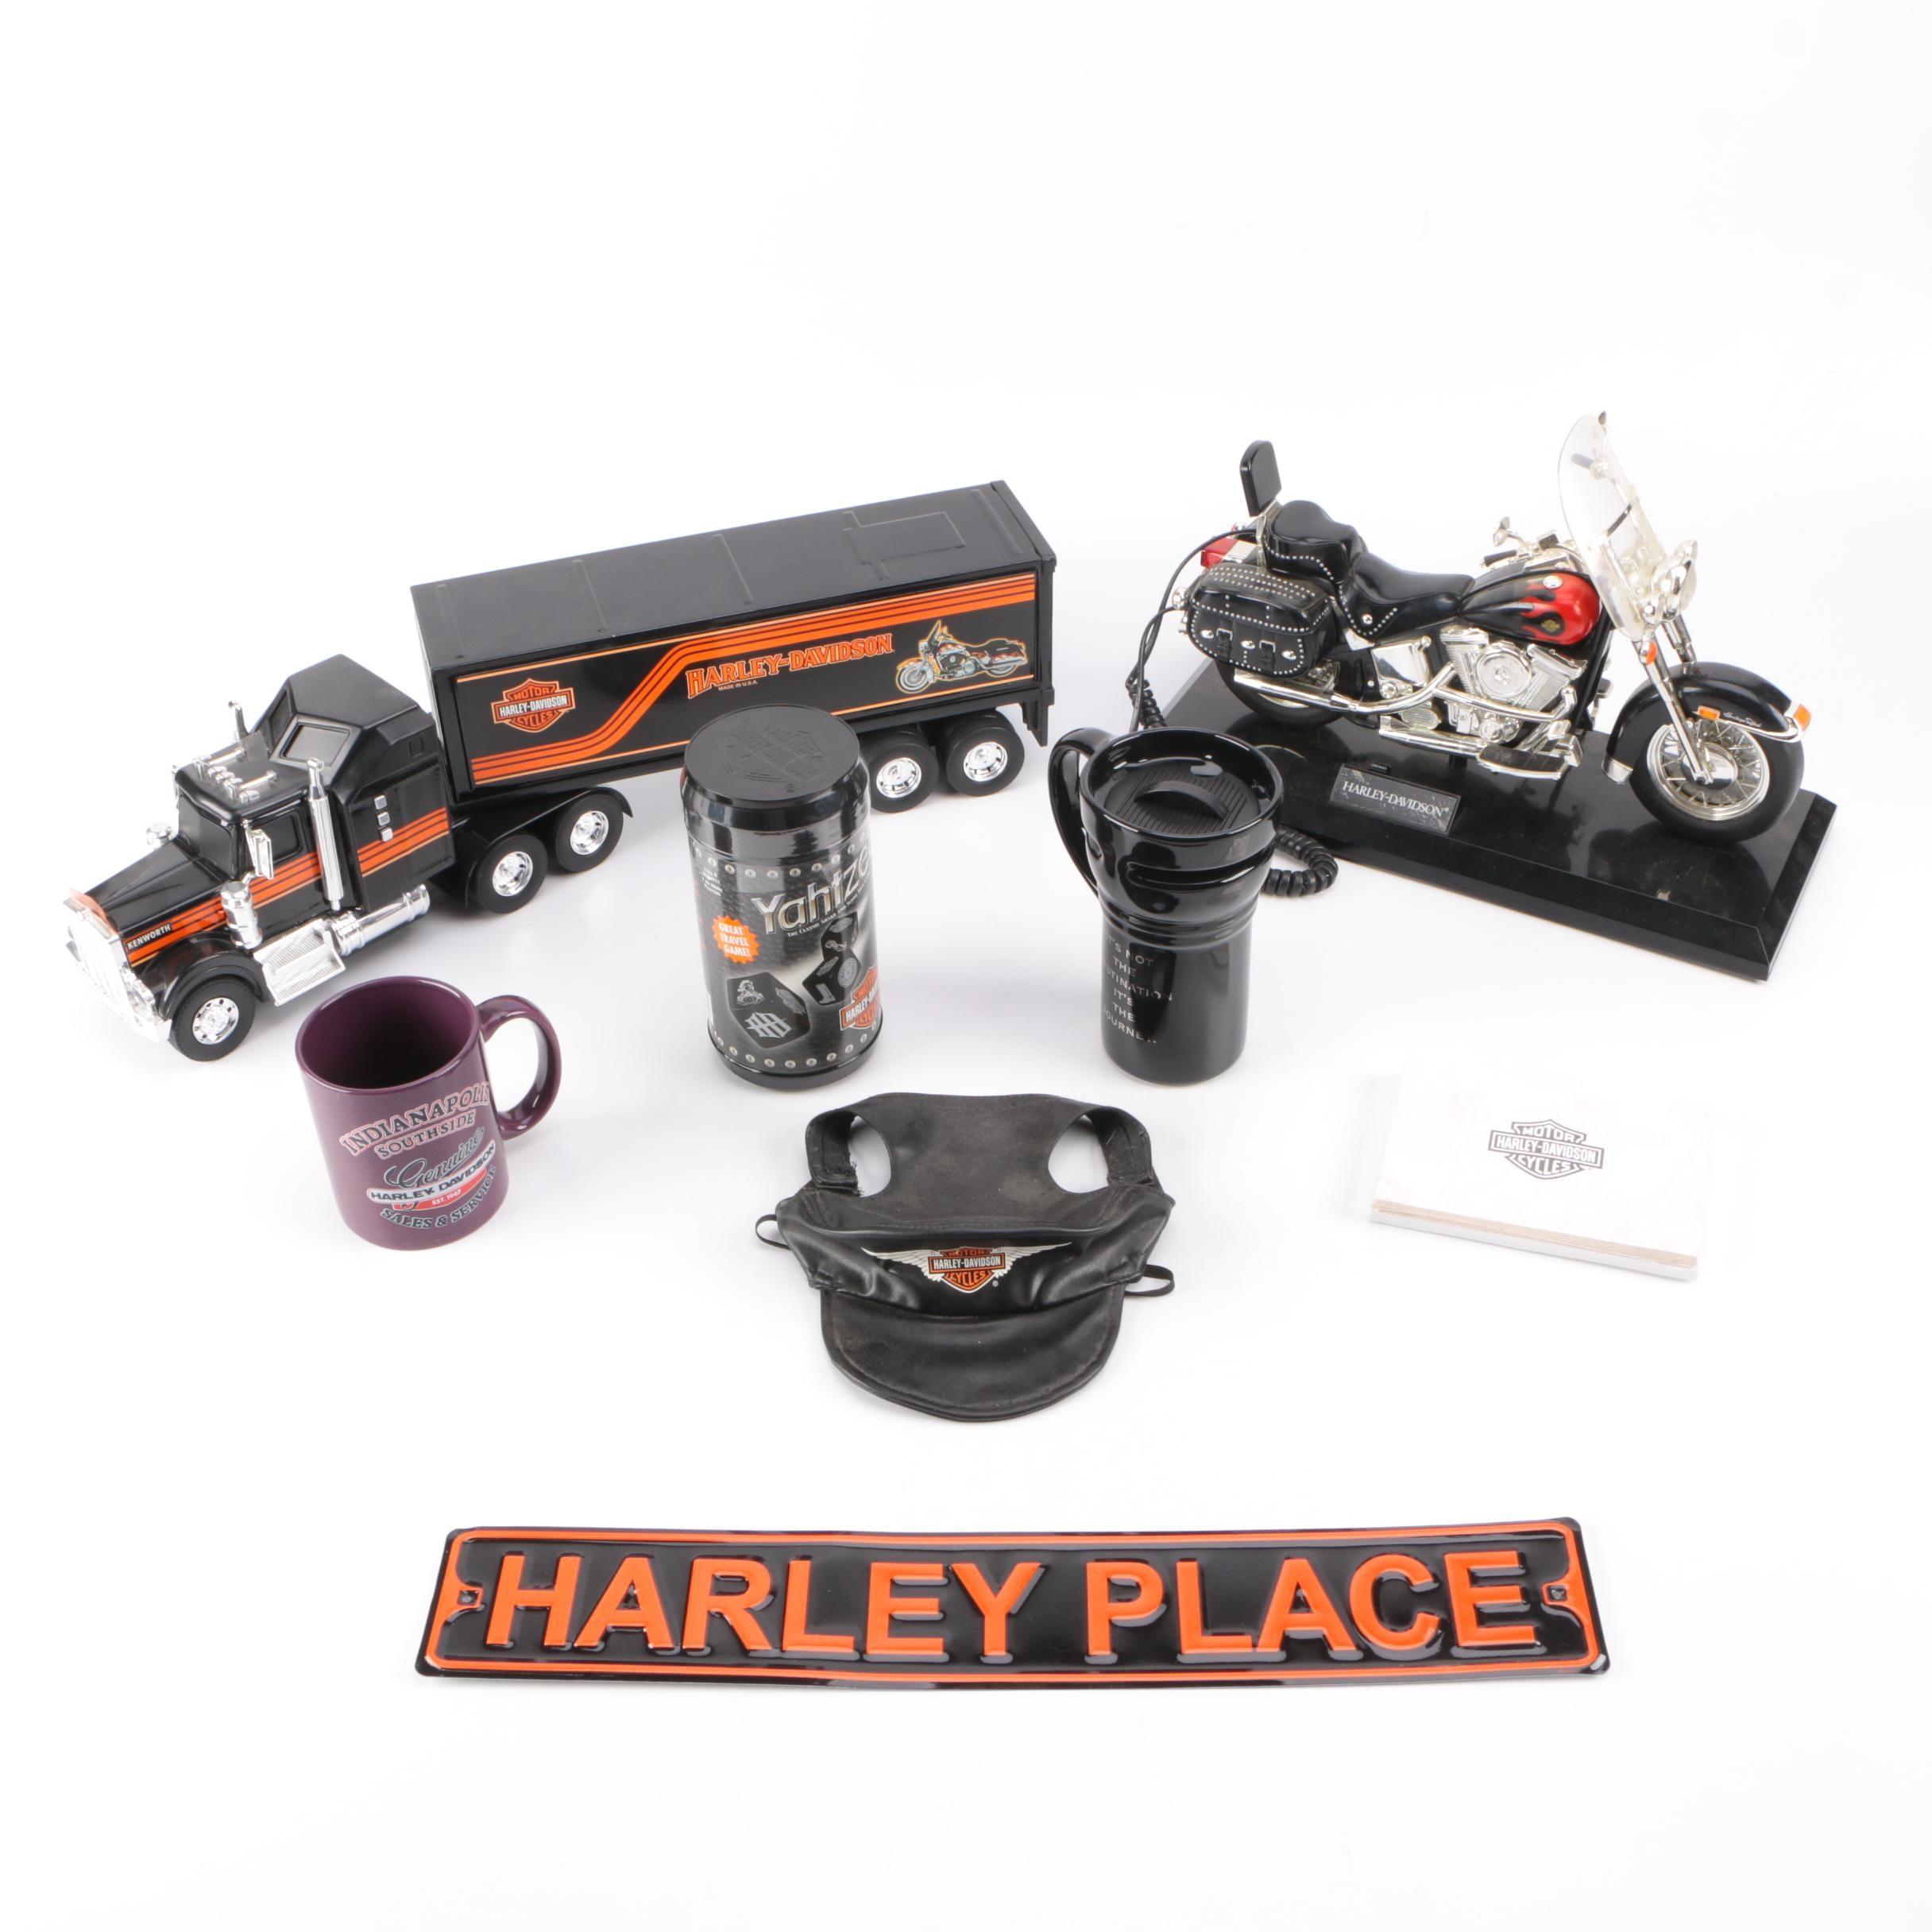 Collection of Harley Davidson Memorabilia